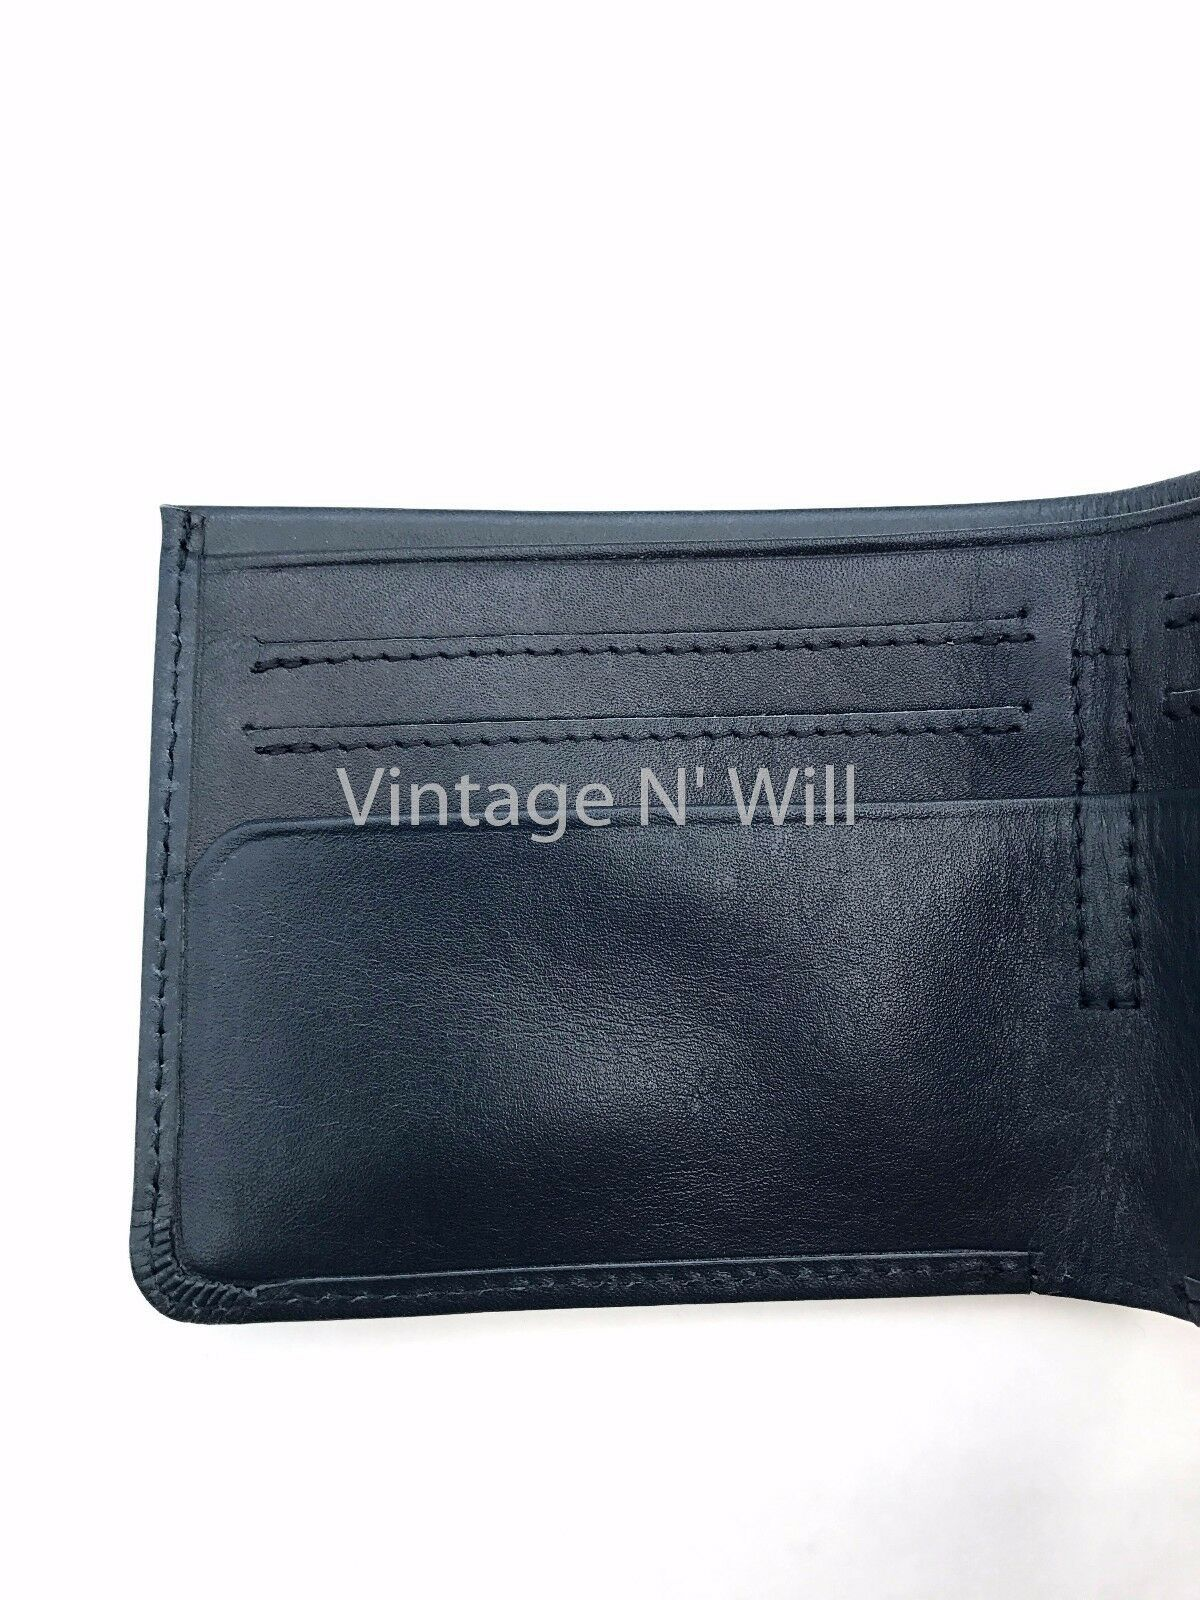 Levis Jeans Mens 511 Slim Navy Blue Genuine Leather Wallet Billfold Bifold Card image 6